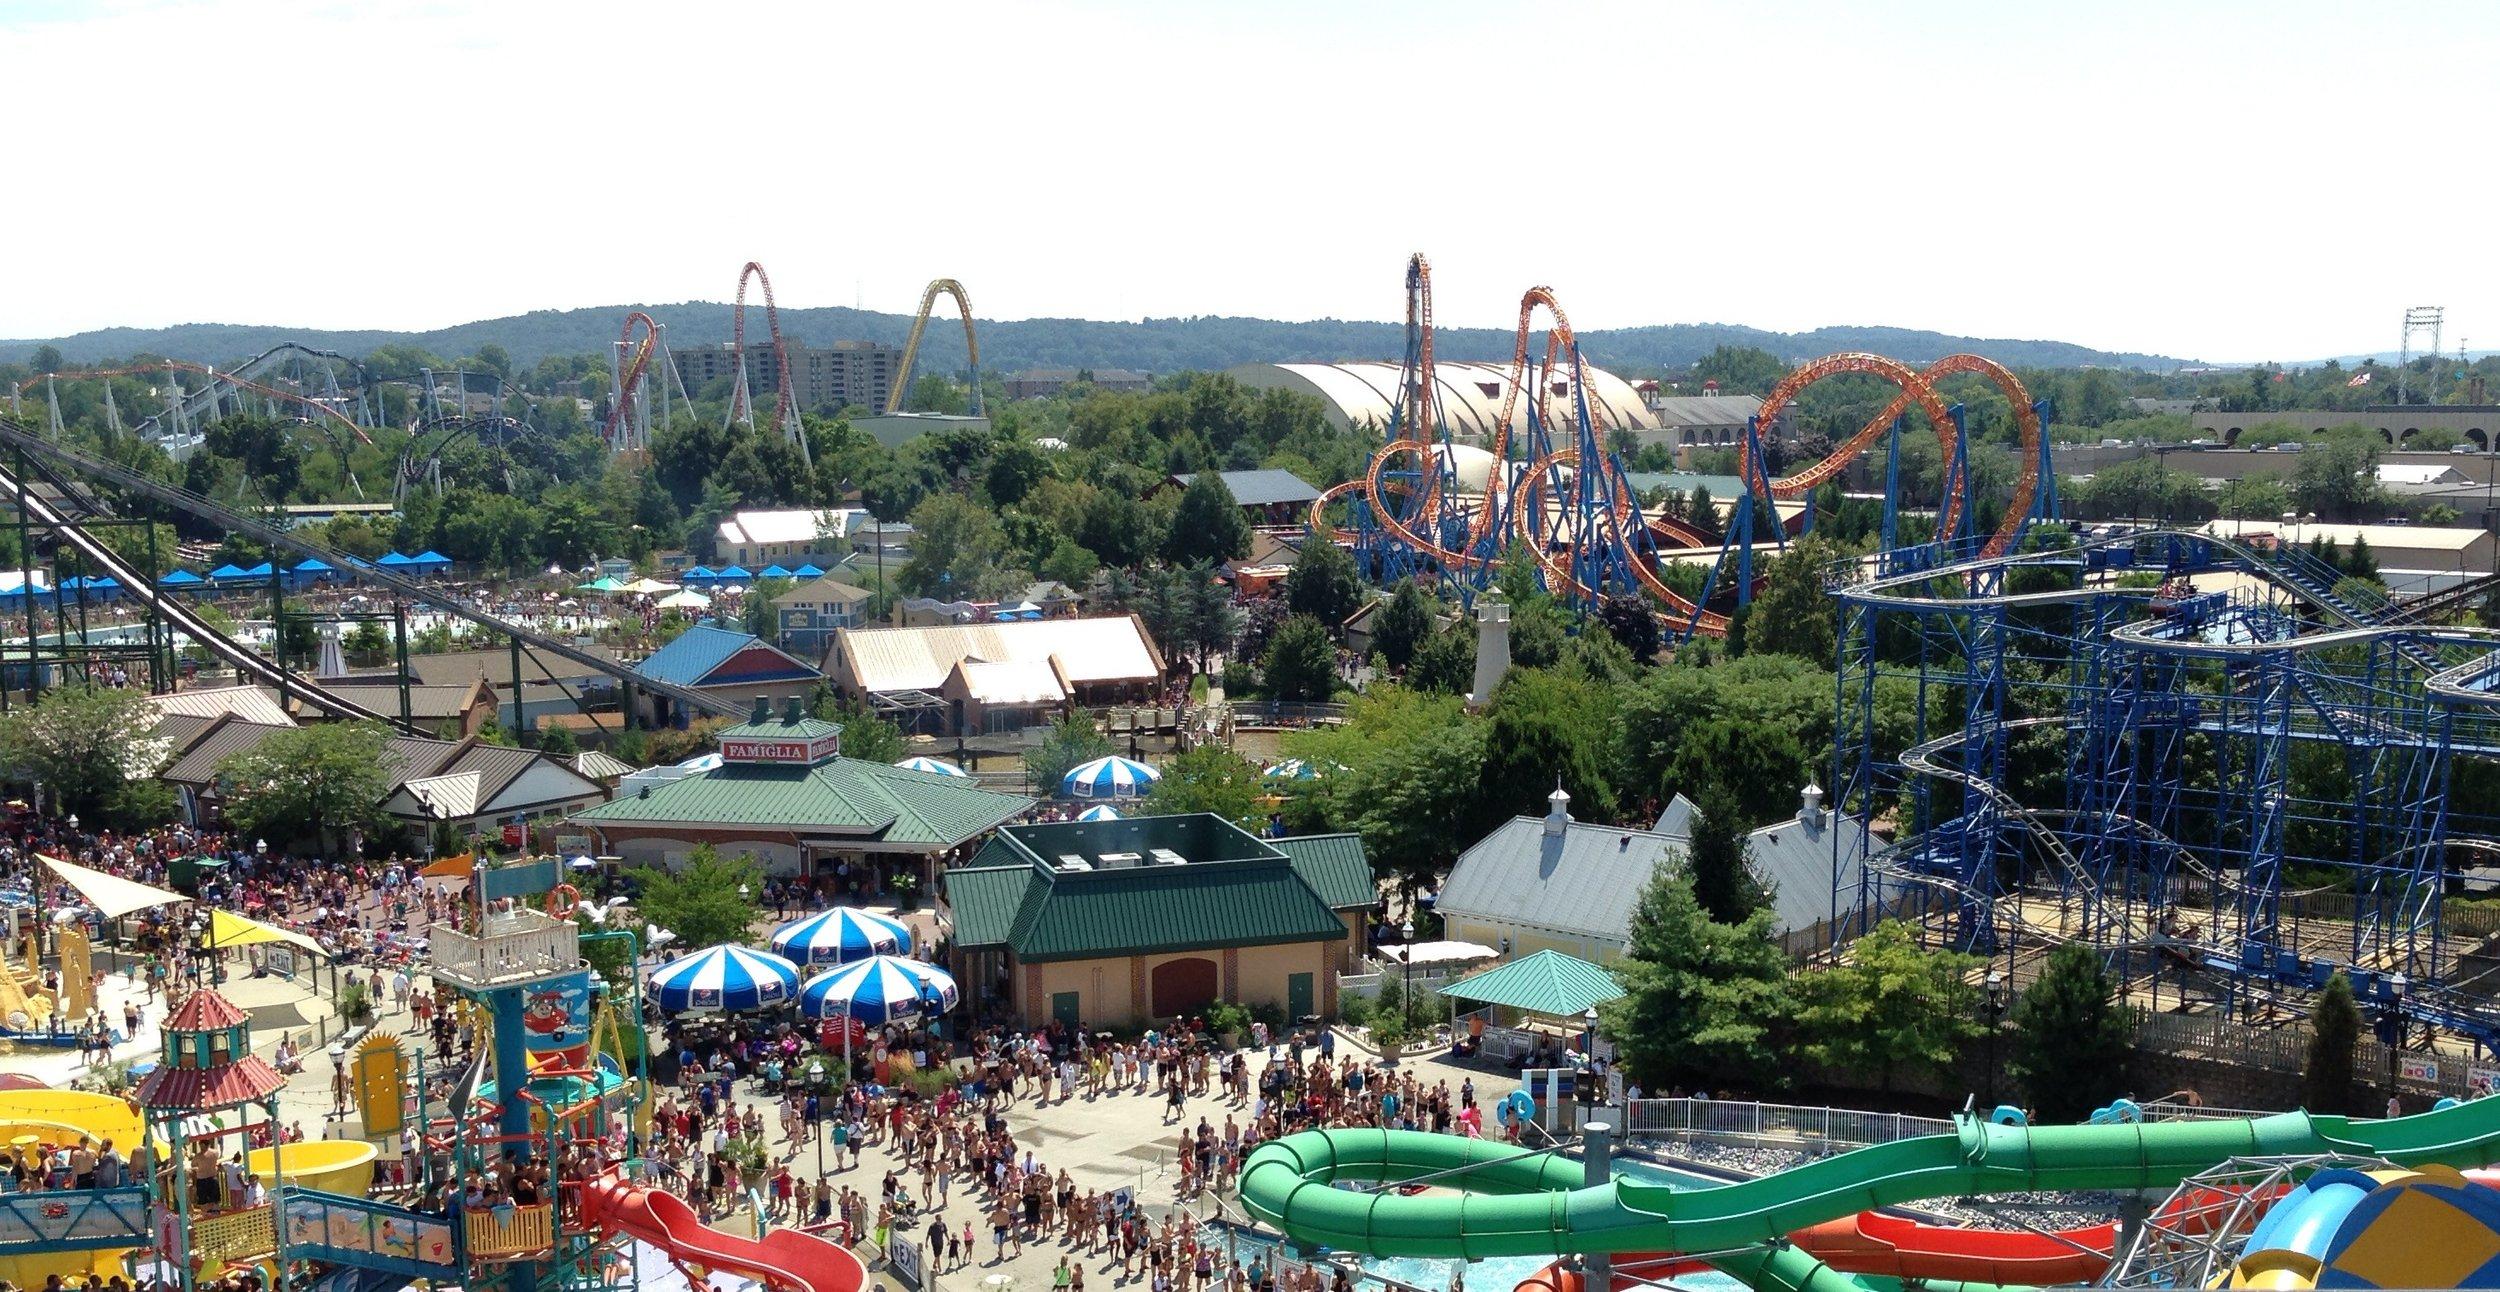 Hersheypark_view_from_Ferris_Wheel,_2013-08-10_(cropped).jpg